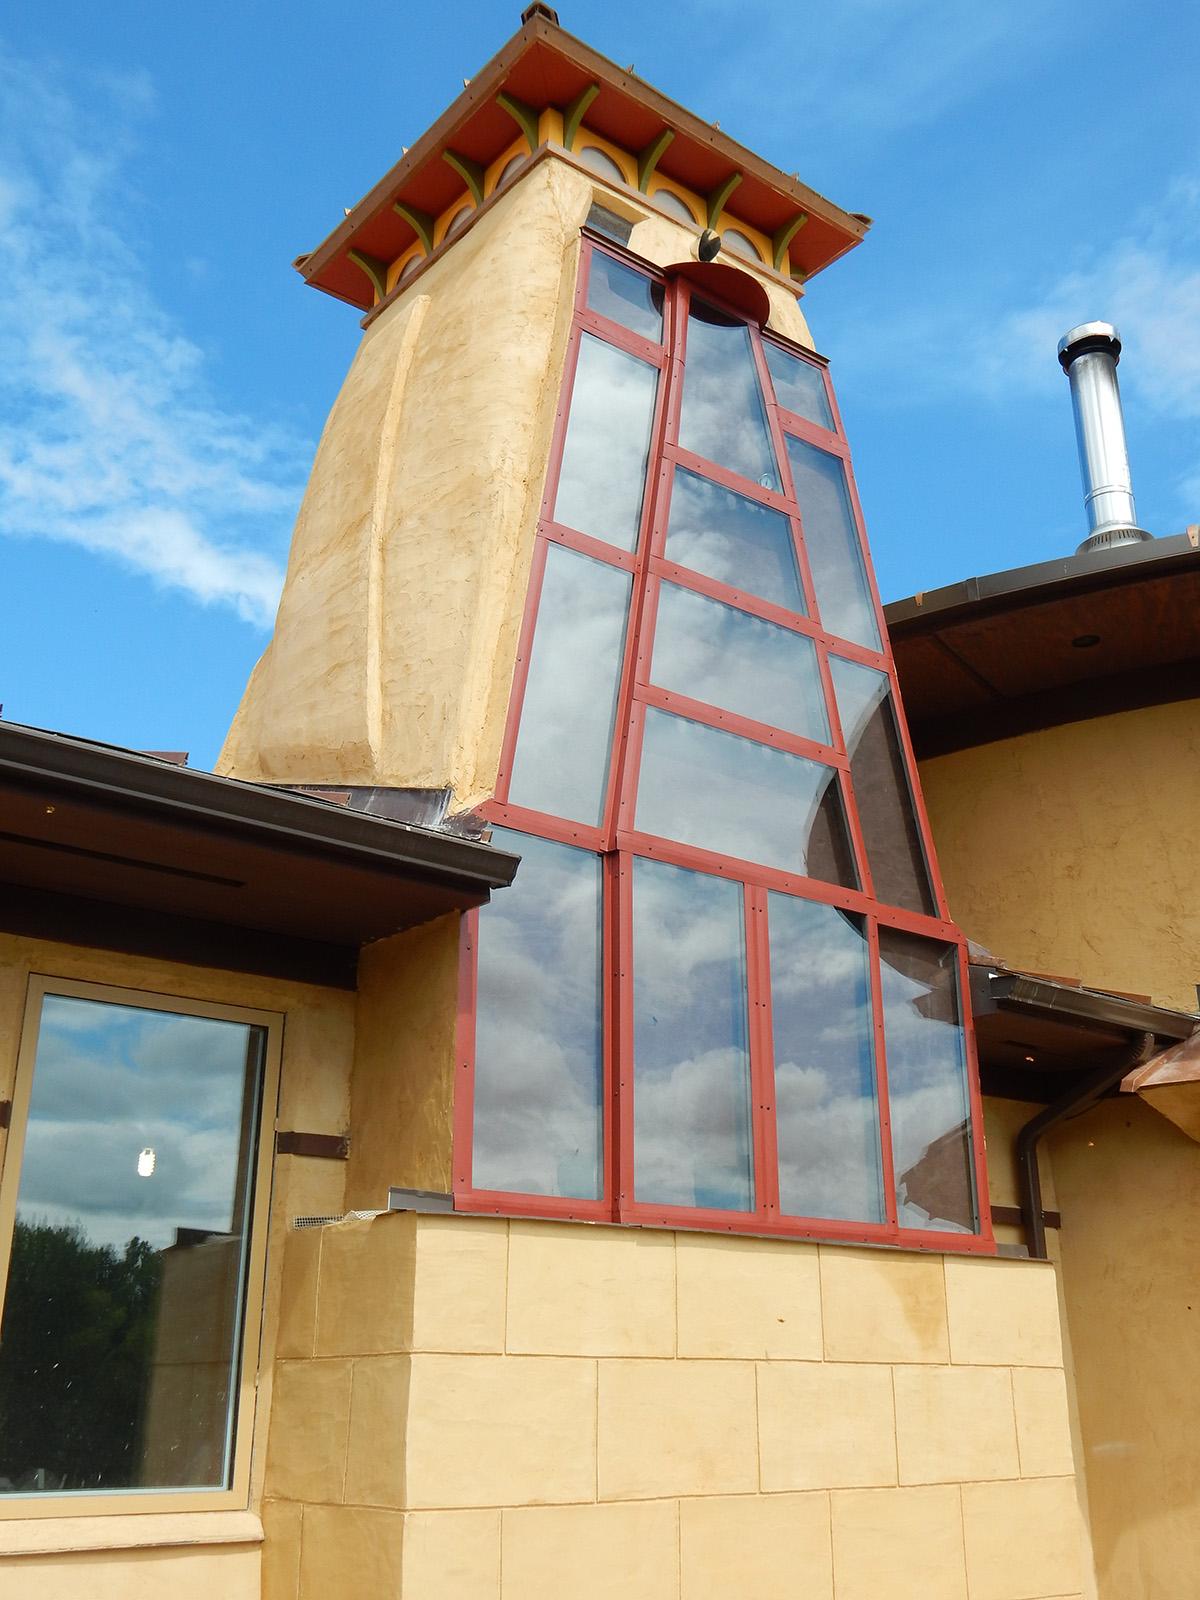 Solar Dragon House - Solar chimney